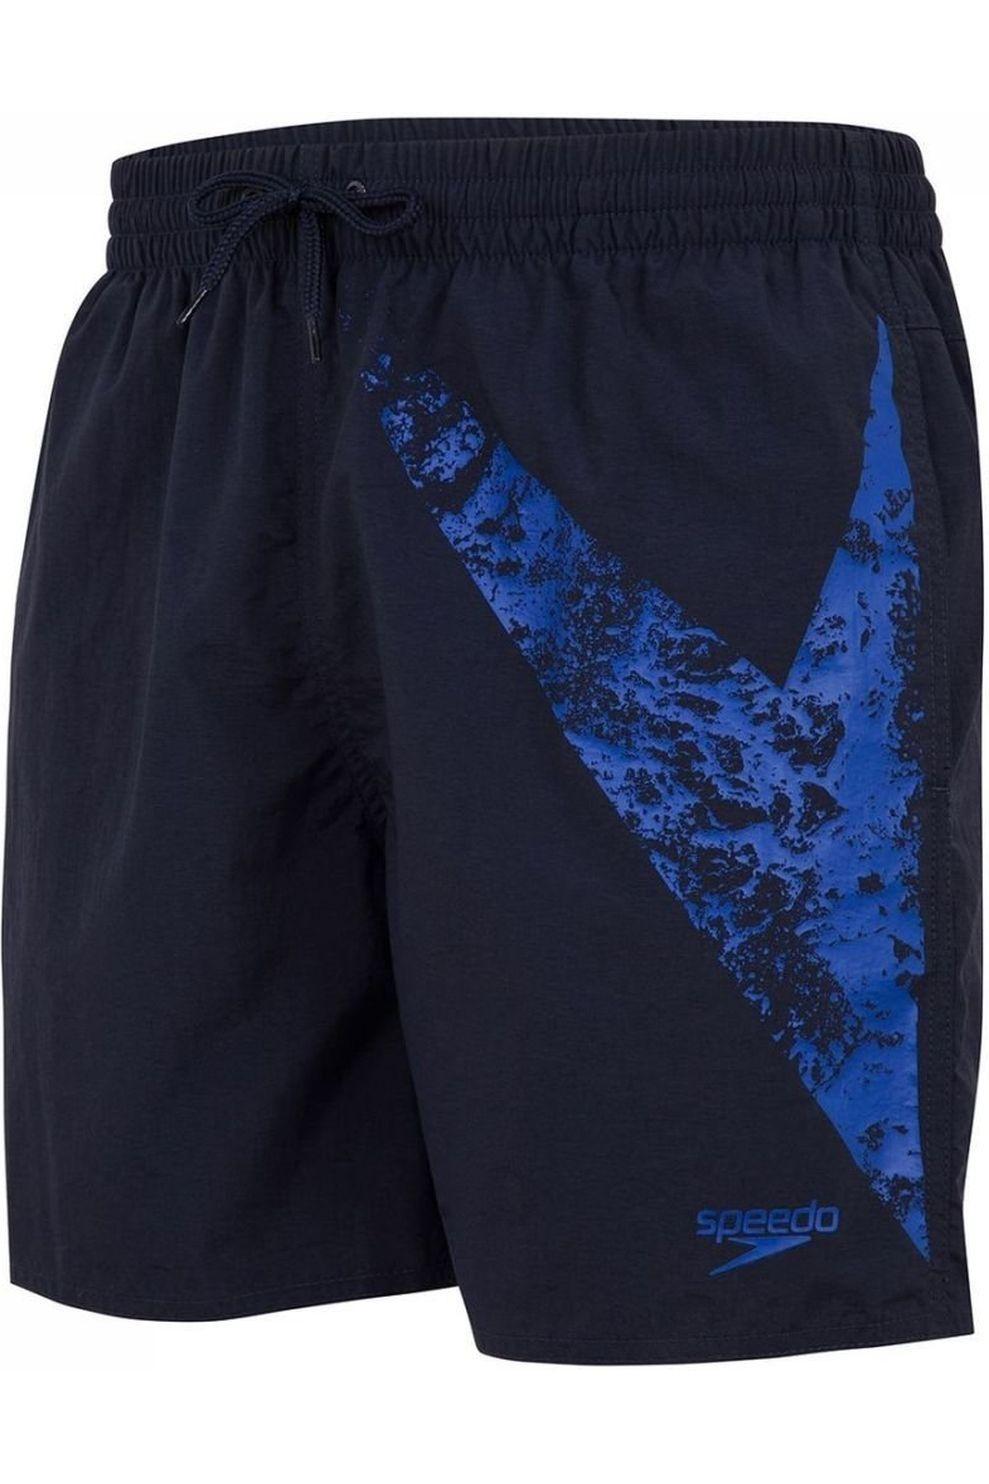 Speedo Zwemshort Boomstar16 voor heren - Blauw - Maten: S, M, L, XL, XXL